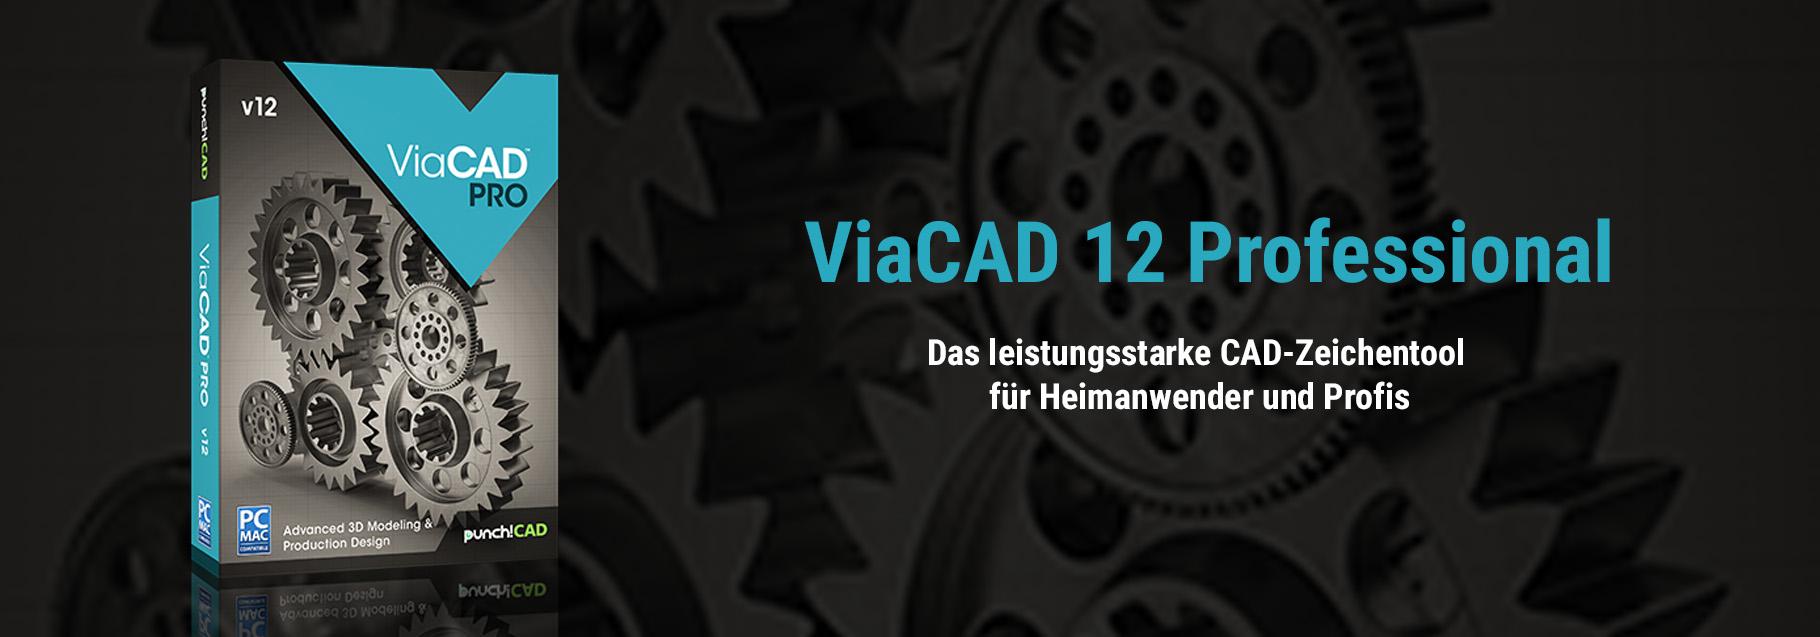 ViaCAD12_Pro